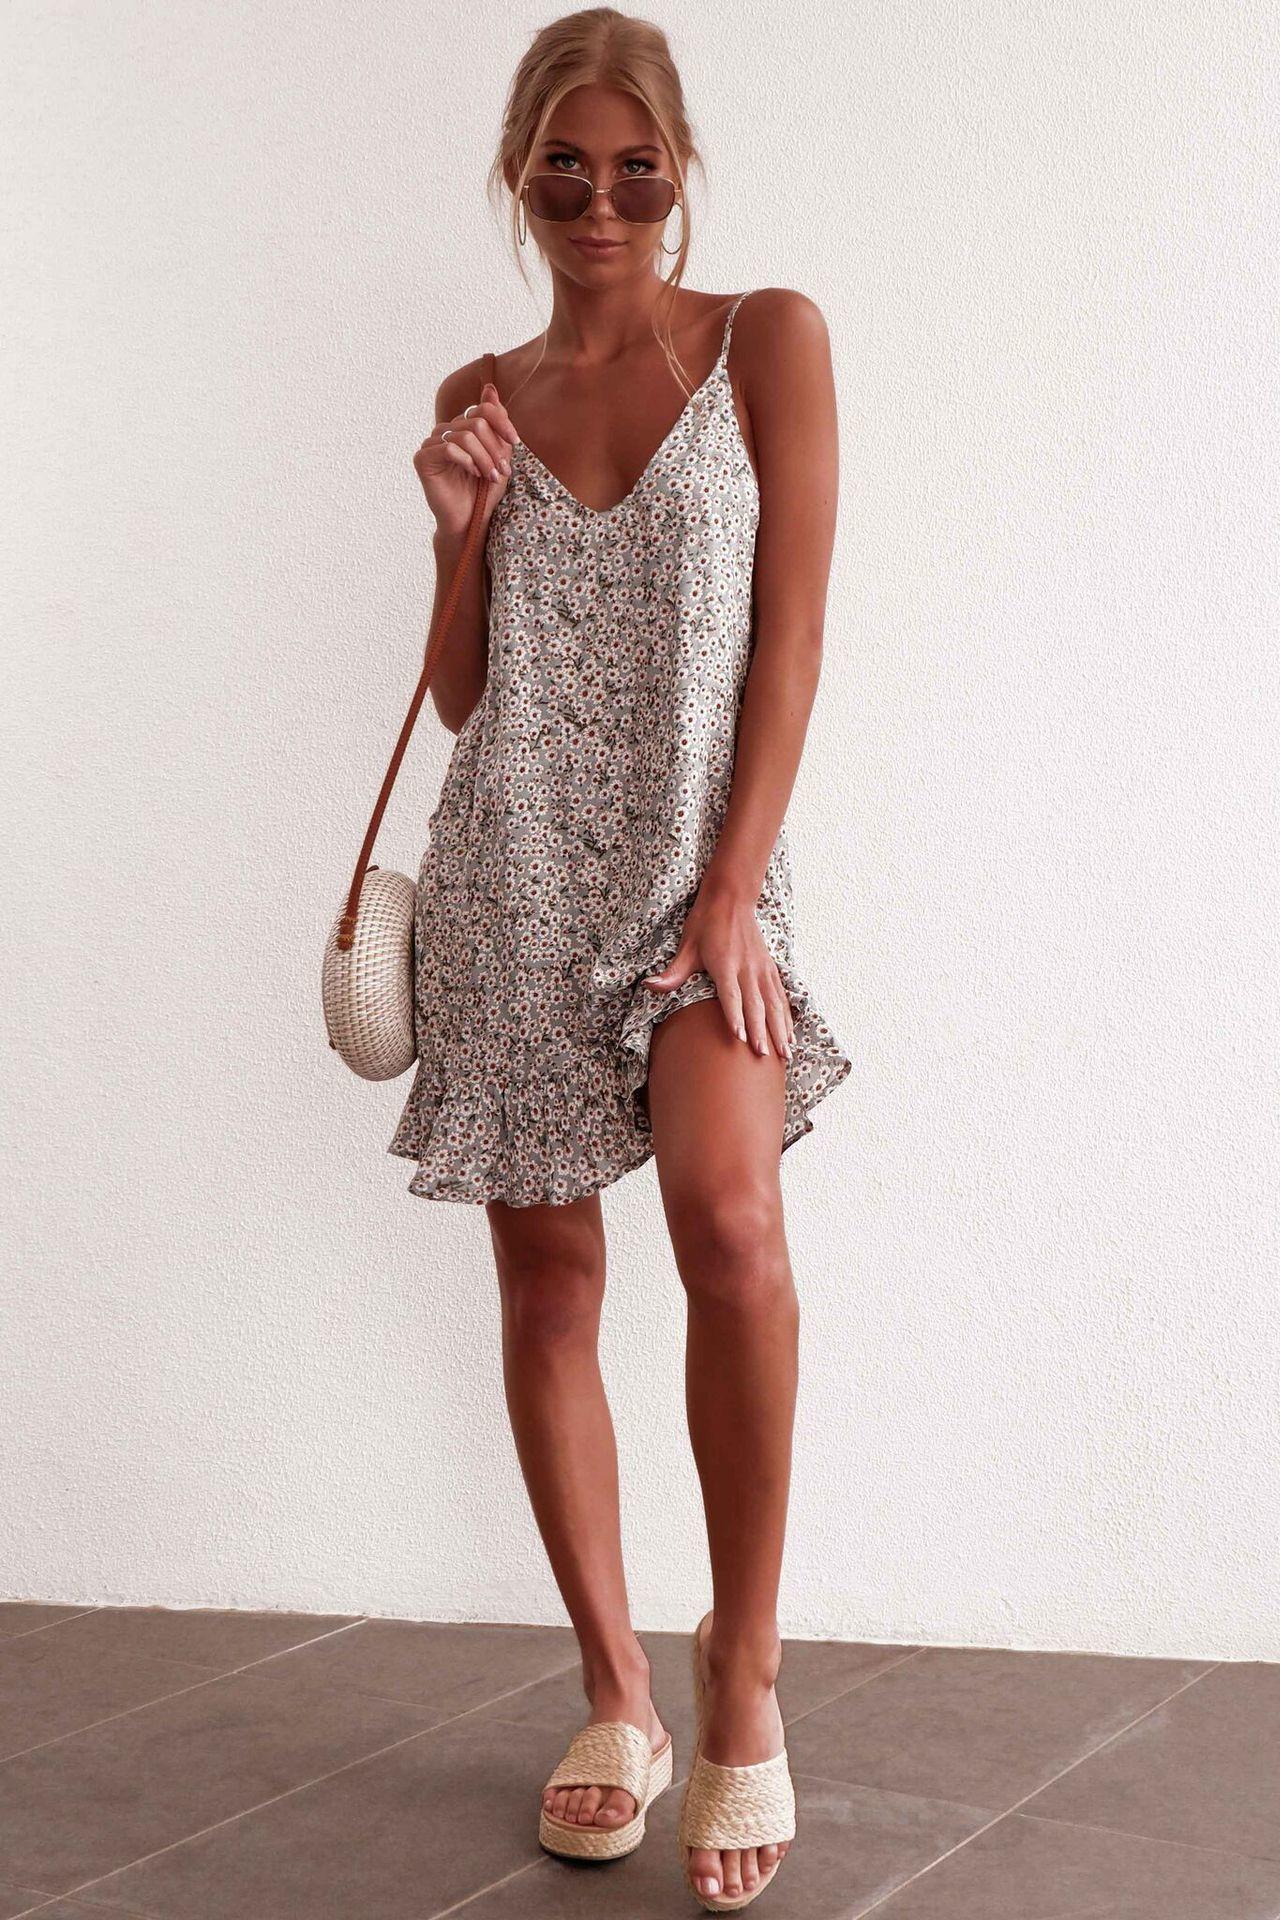 care-for-you-dress-dress-mishk